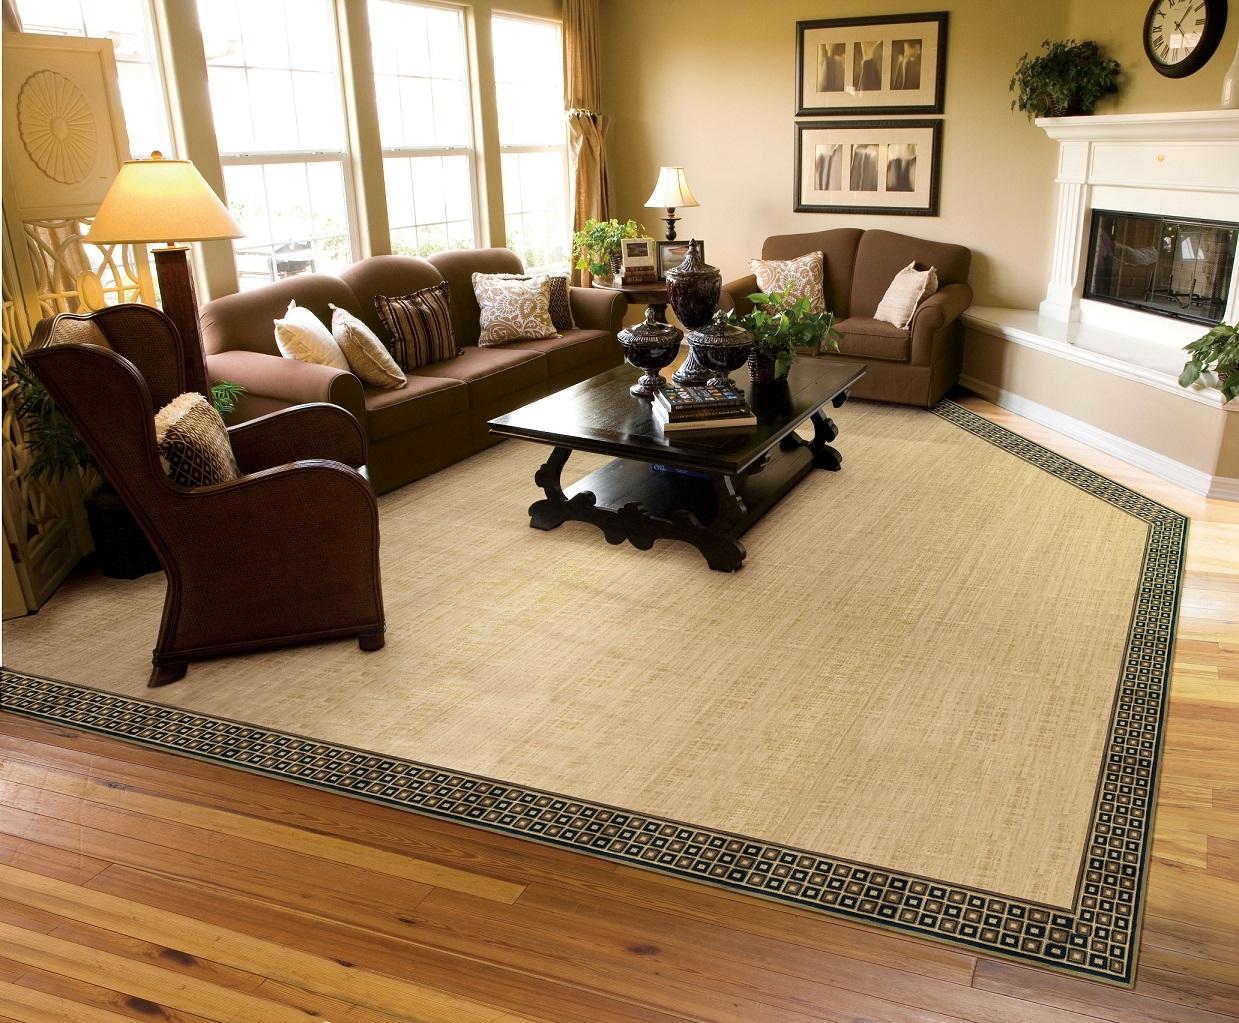 Area Rugs Carpet Hardwood Laminate Flooring In San Francisco With Regard To Customized Rugs (Image 1 of 15)